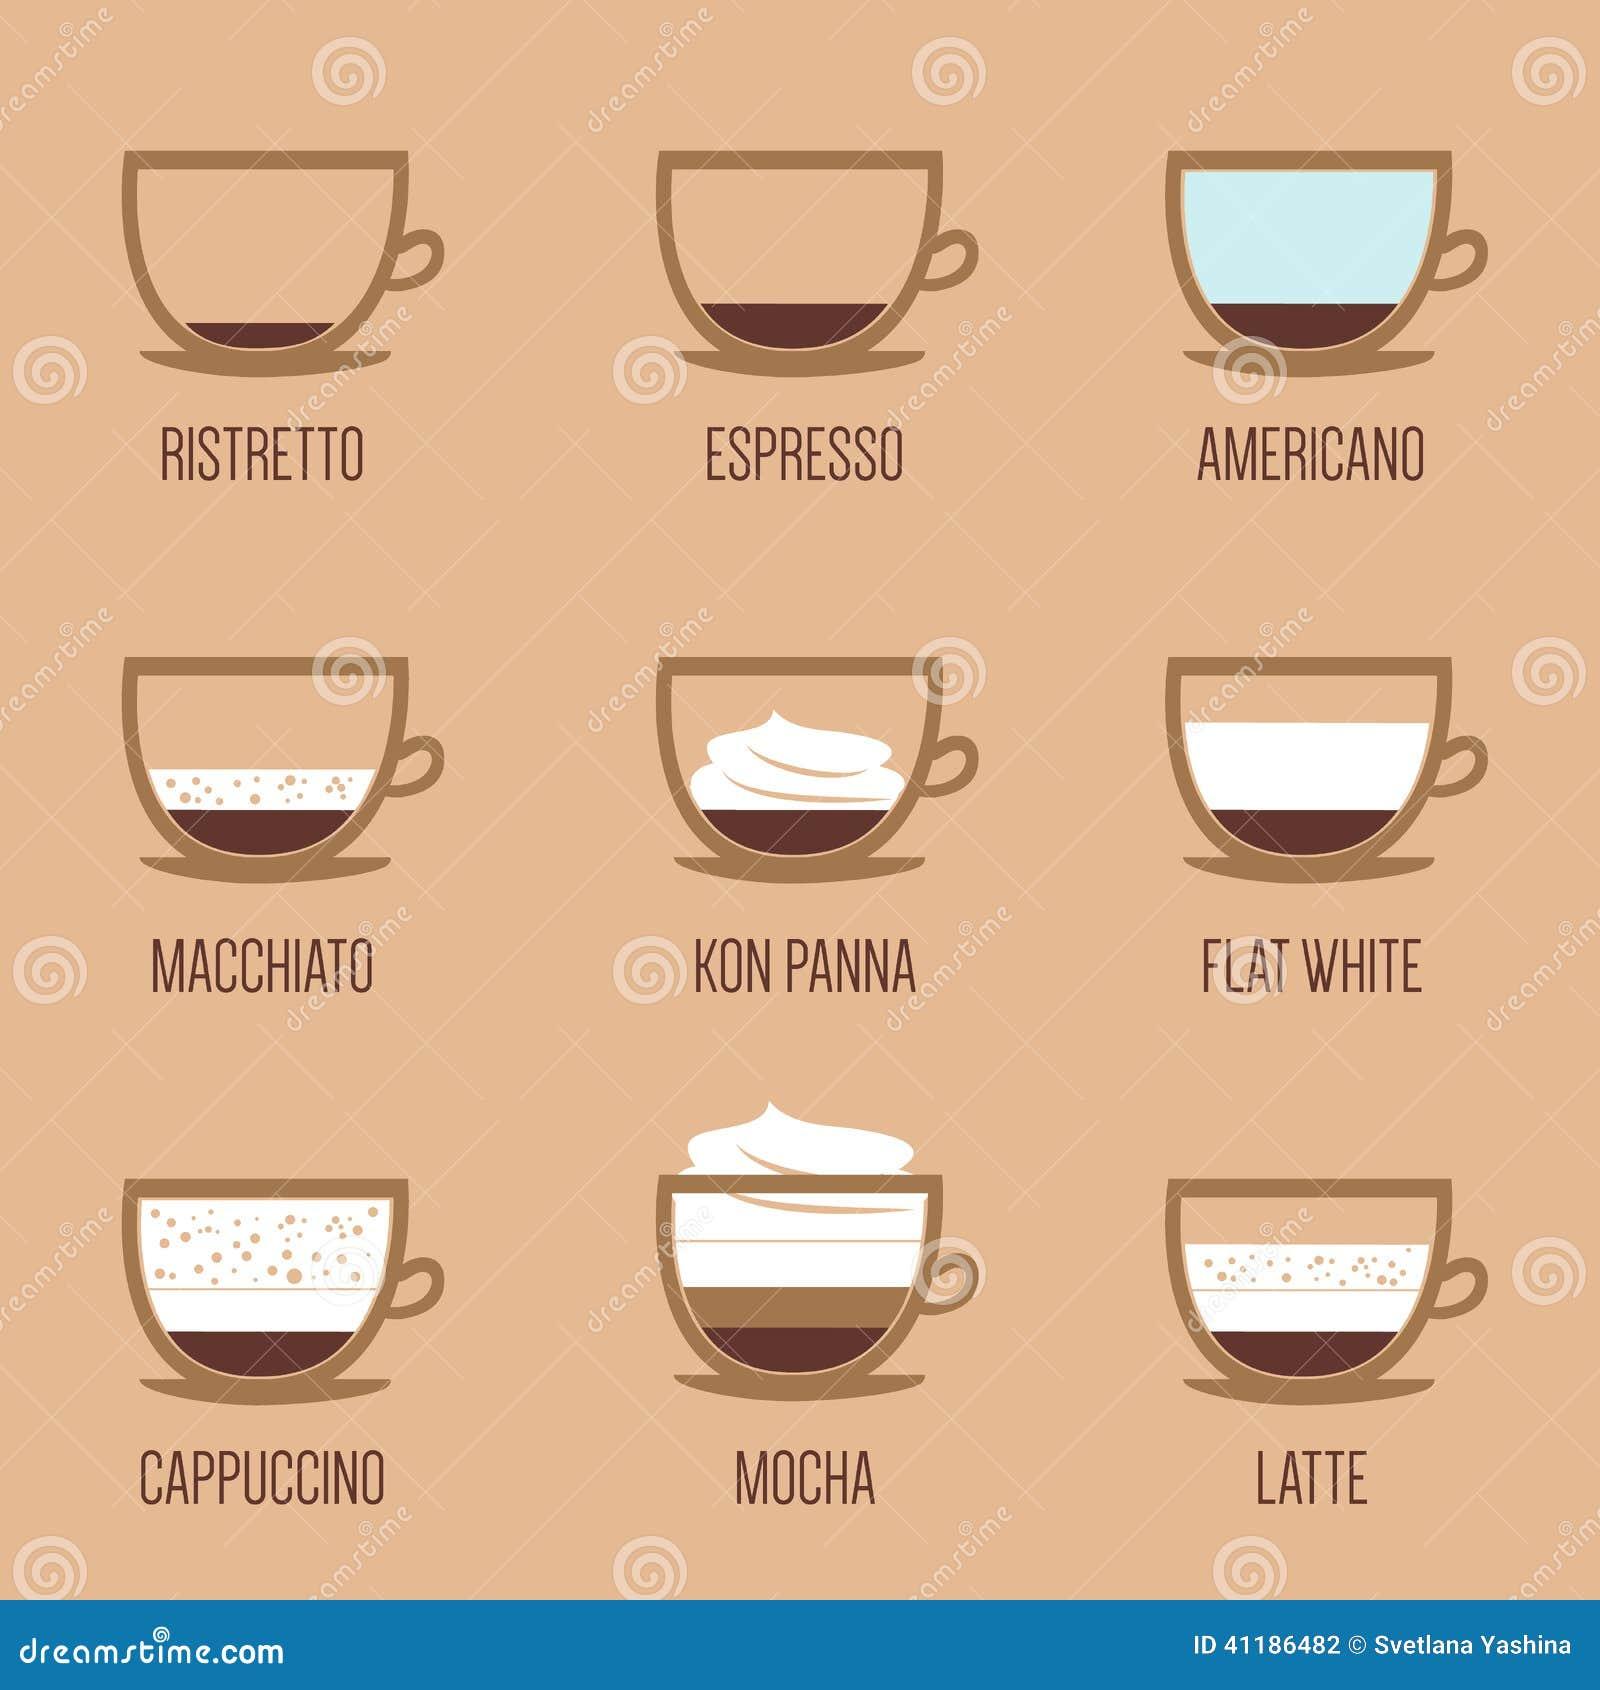 Coffee Infographic Stock Vector Illustration Of Cream